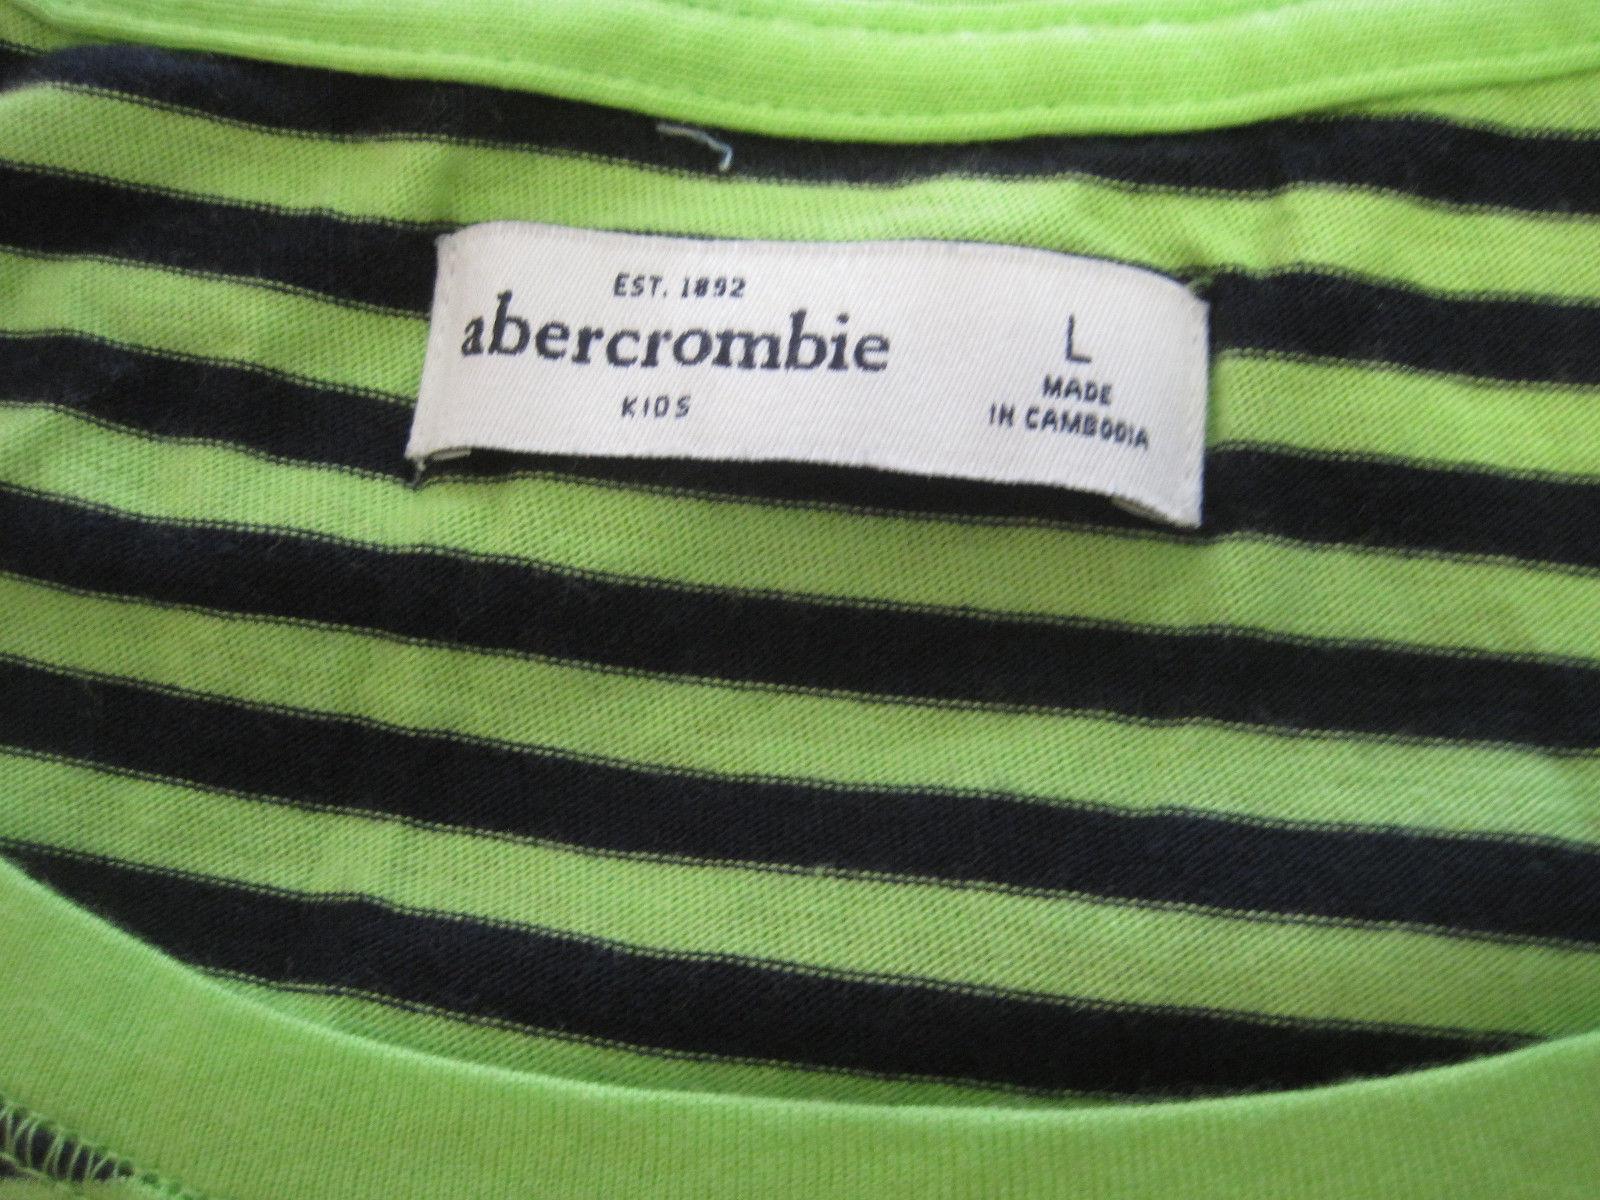 Abercrombie Kids Tee Top Sz L 14 Black Green Stripe Long Sleeve Cotton Blend New